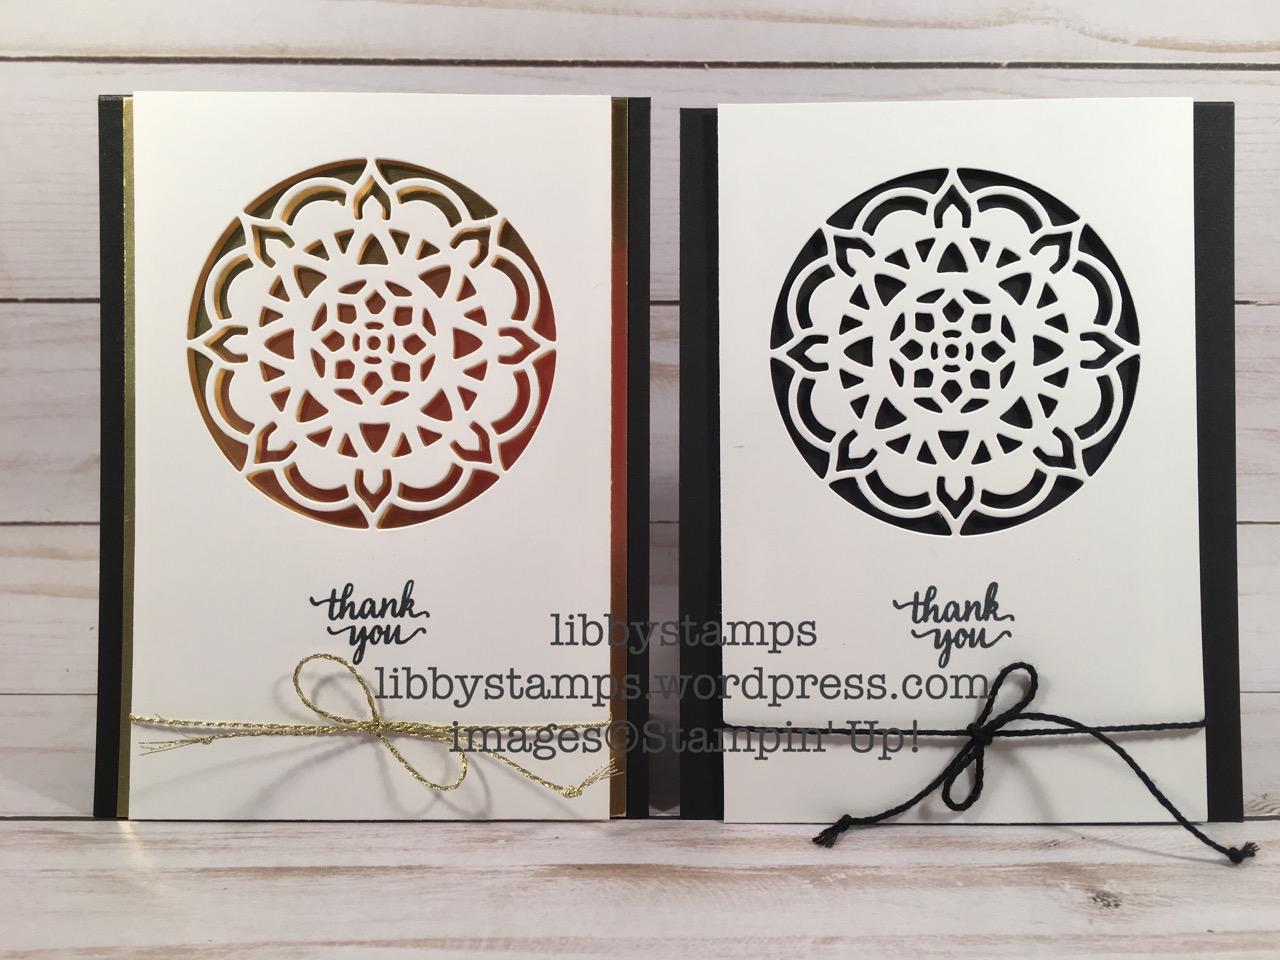 libbystamps, stampin up, Eastern Beauty Bundle, We Create, Eastern Beauty, Eastern Medallions Thinlits